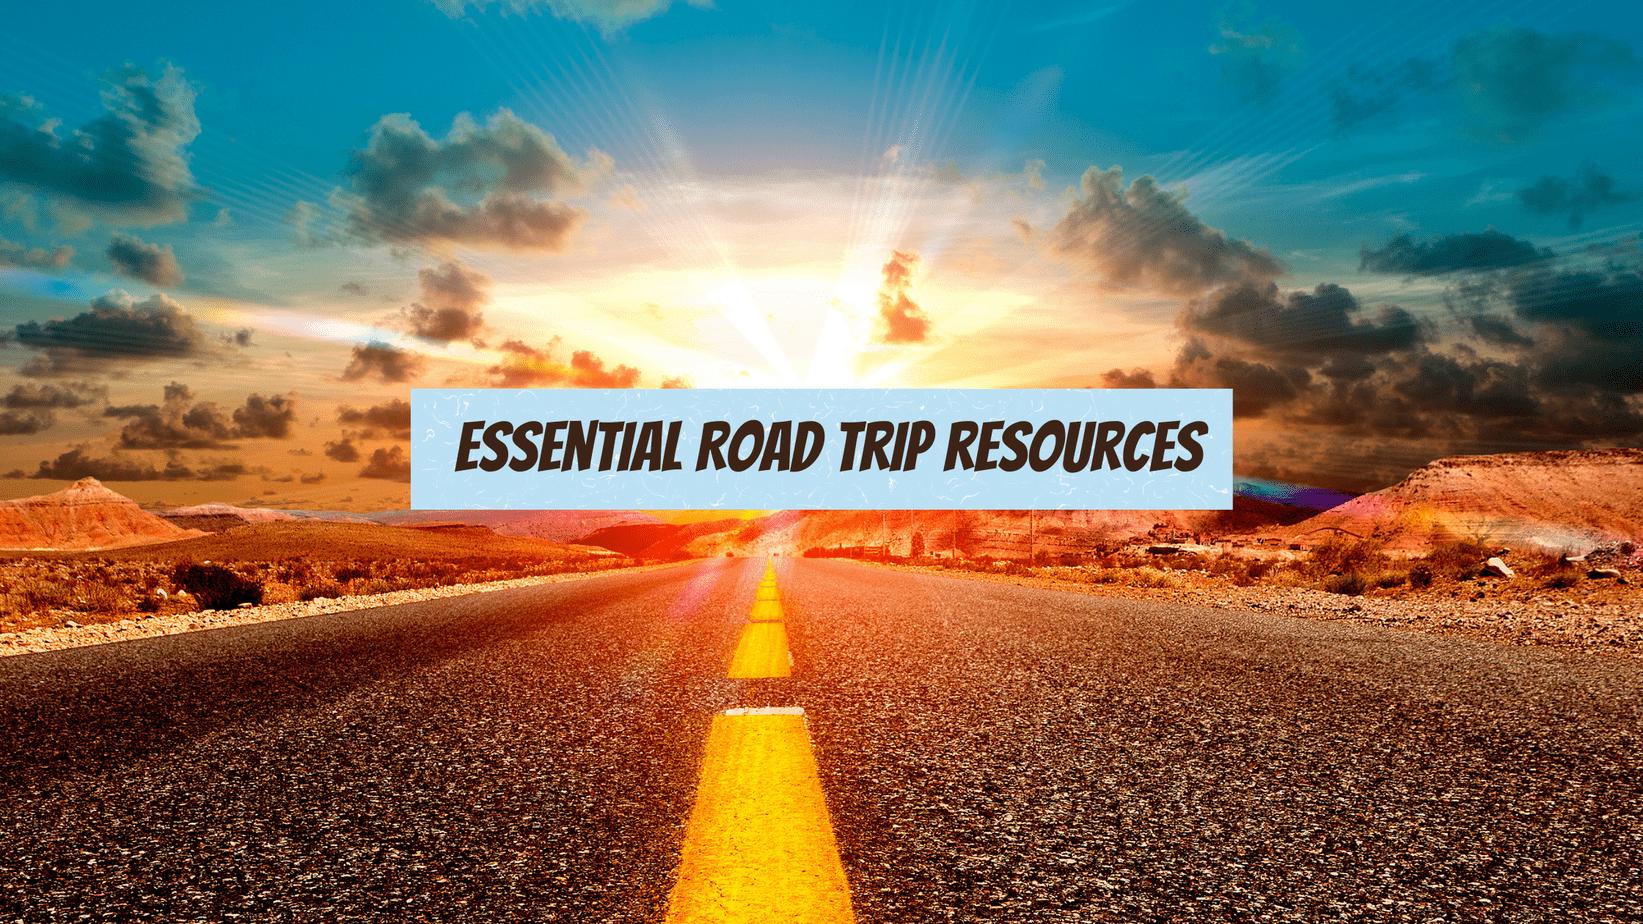 Essential Road Trip Resources